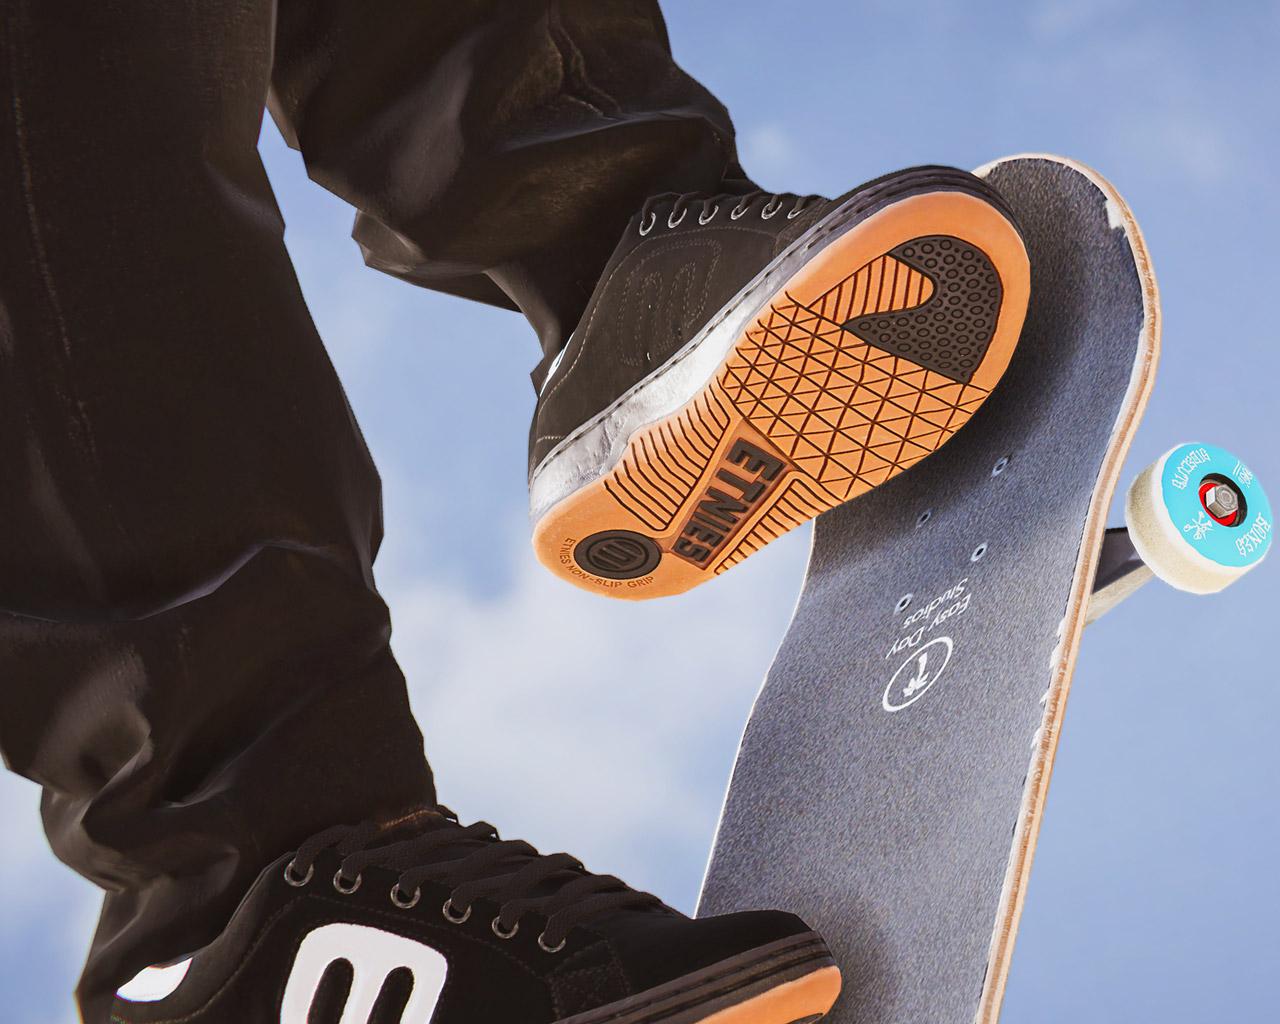 Skater XL Wallpaper in 1280x1024